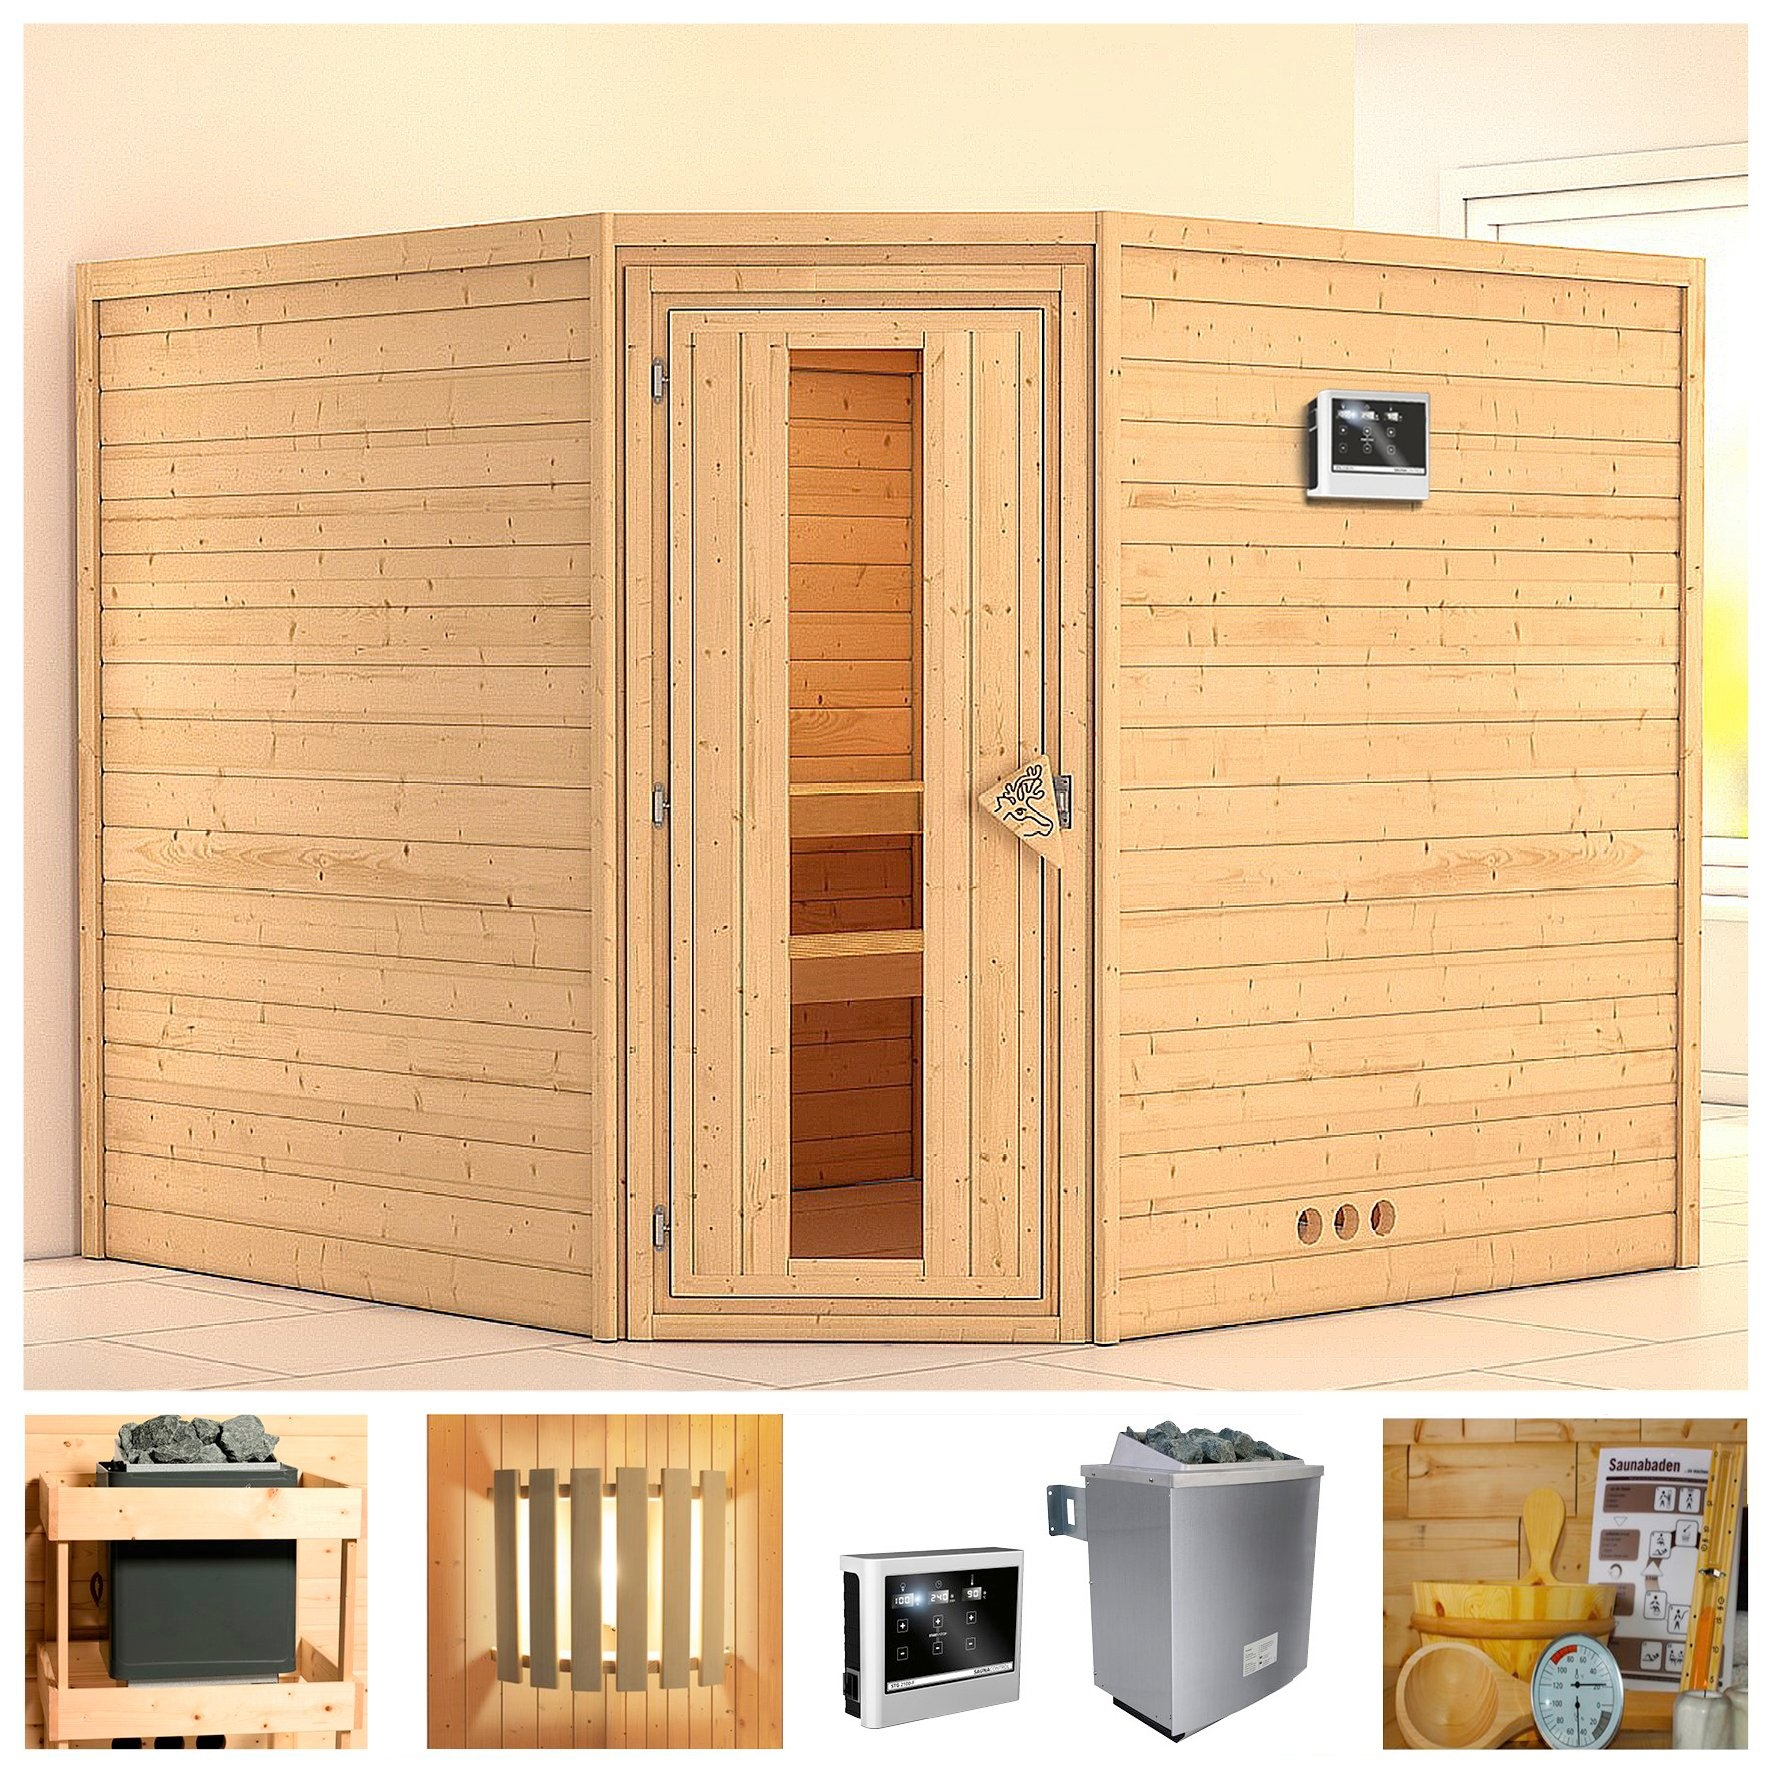 Konifera sauna »Leona«, 231/231/200 cm, 9-kW-Ofen mit ext. Steuerung, Holztür goedkoop op otto.nl kopen